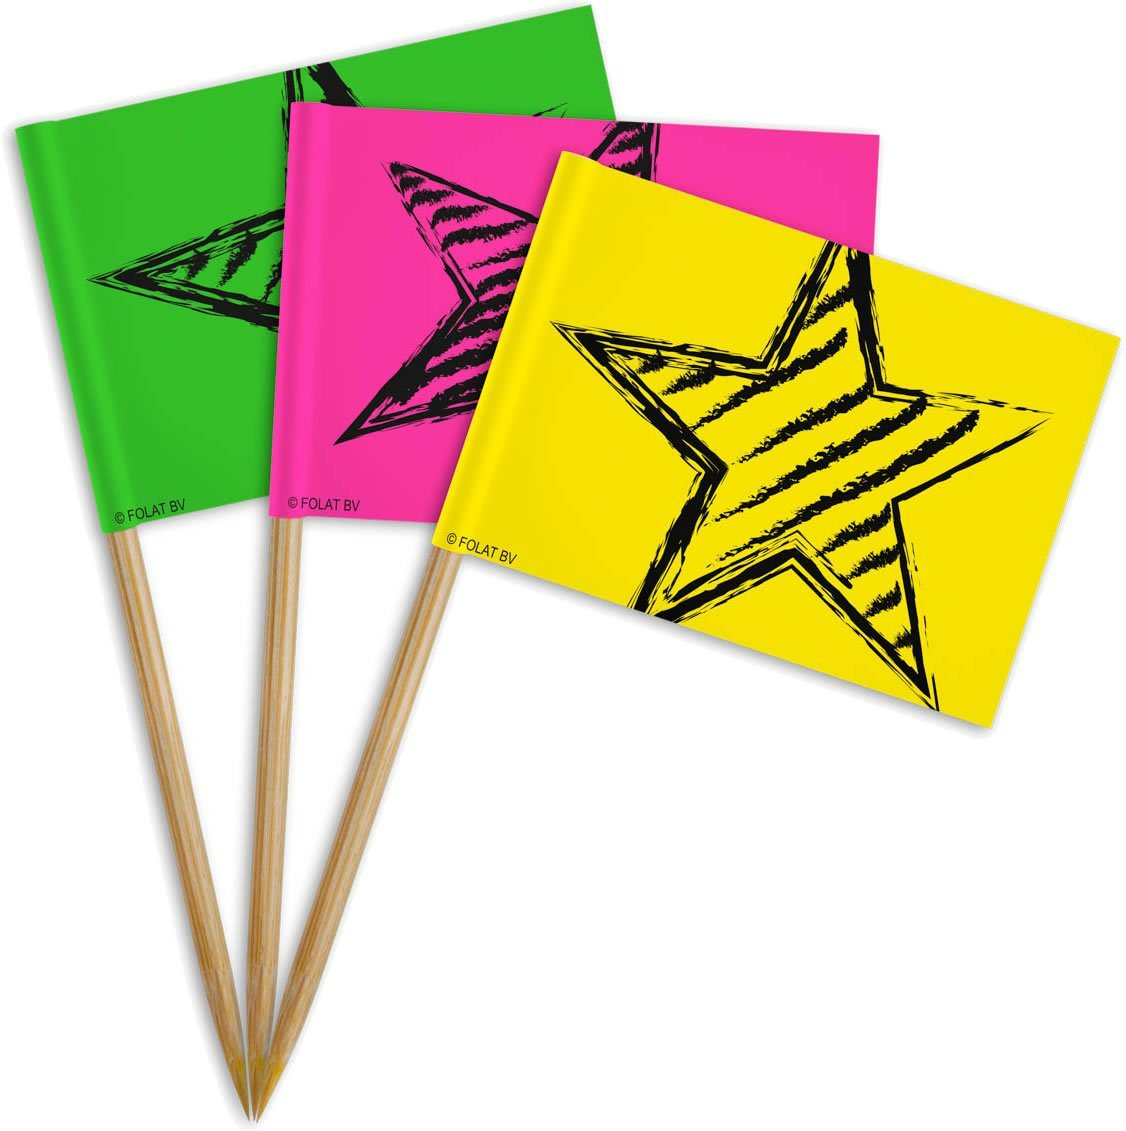 36 Party-Picker in Neon-Farben